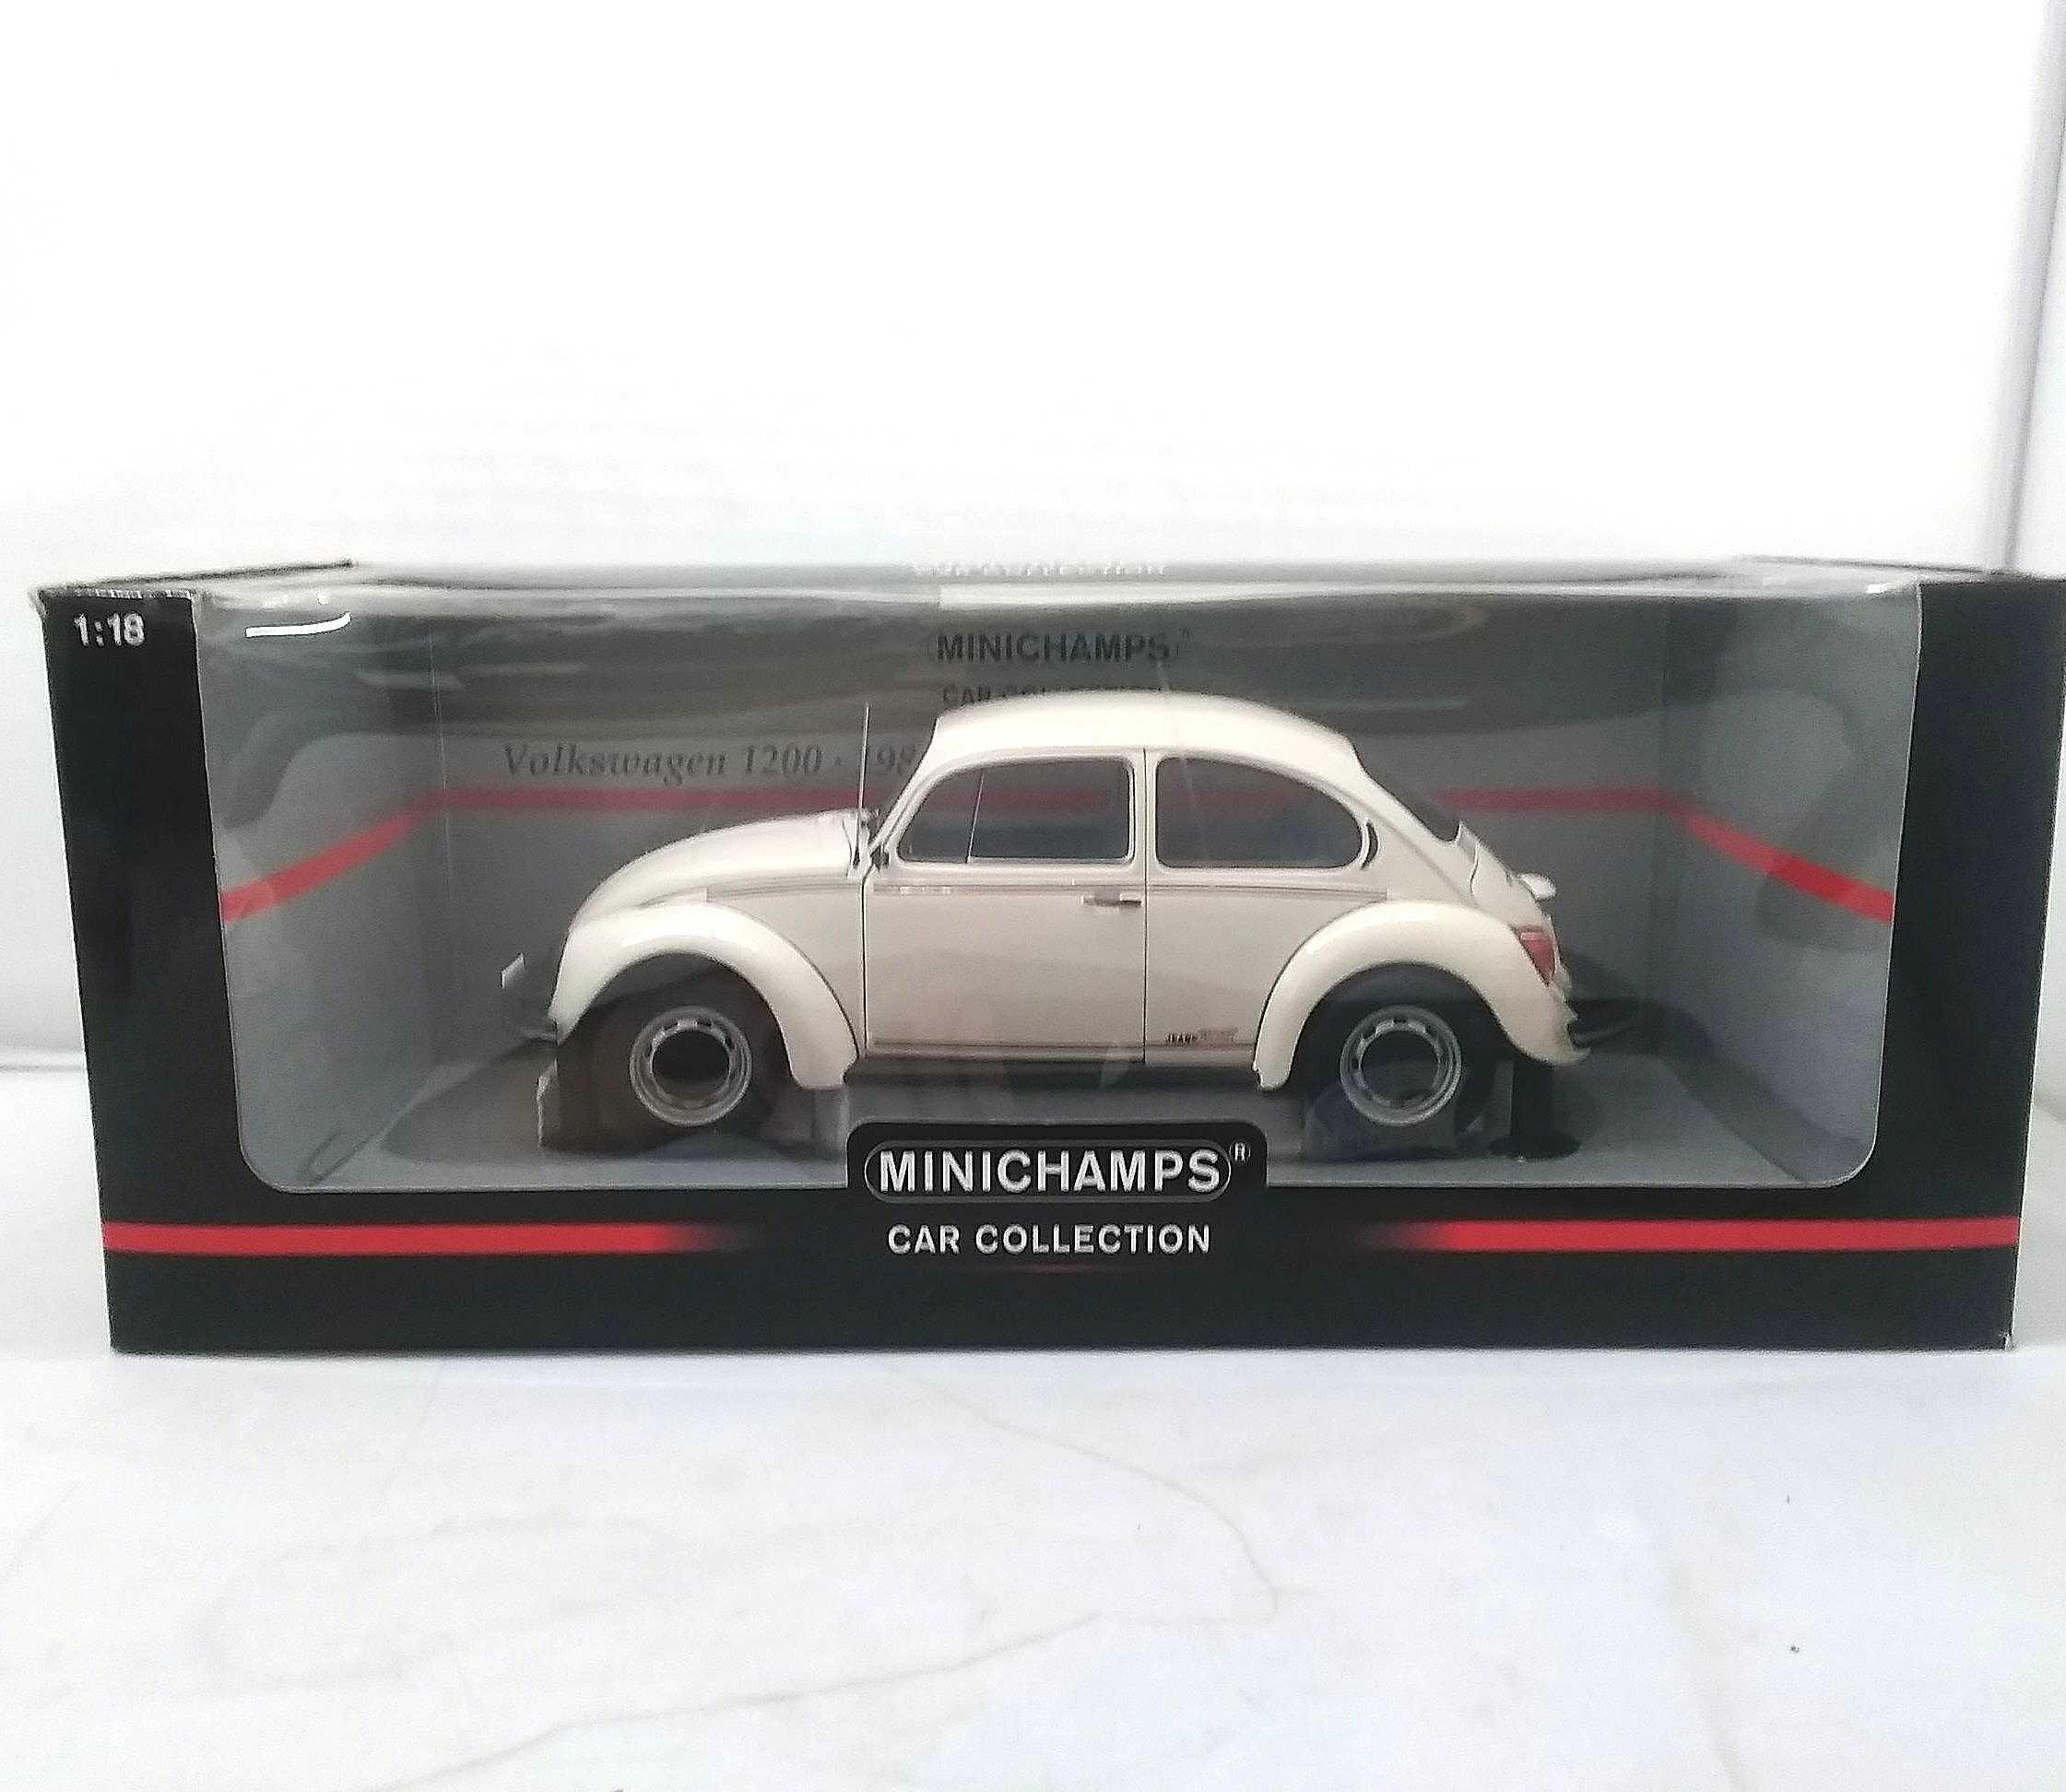 VW 1200 ジーンズバグ 1983|ミニチャンプス